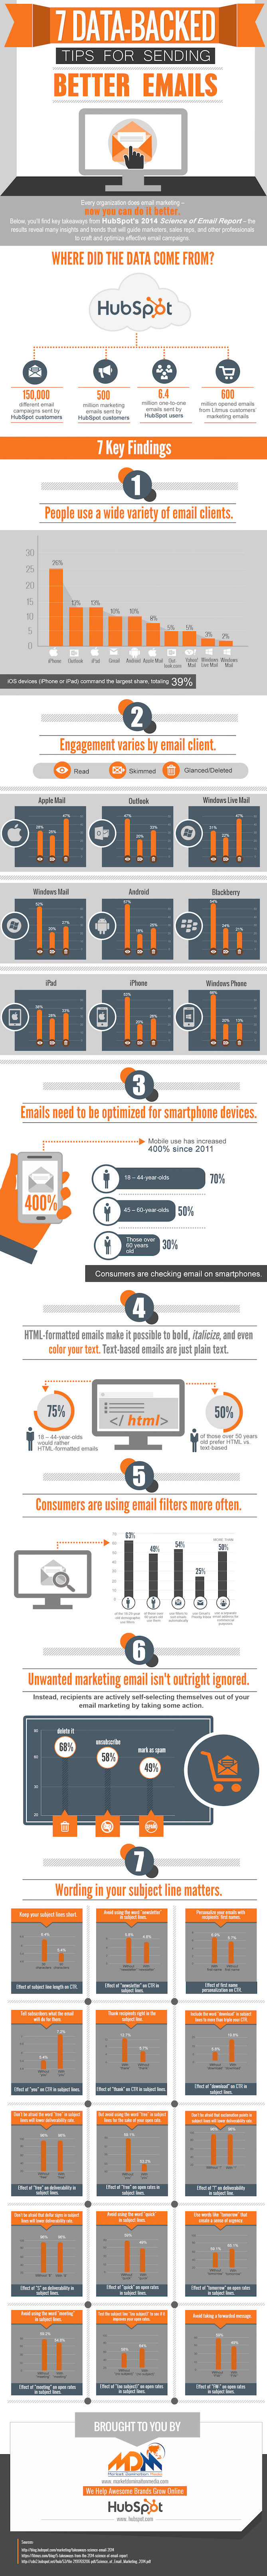 sending-better-emails-infographic